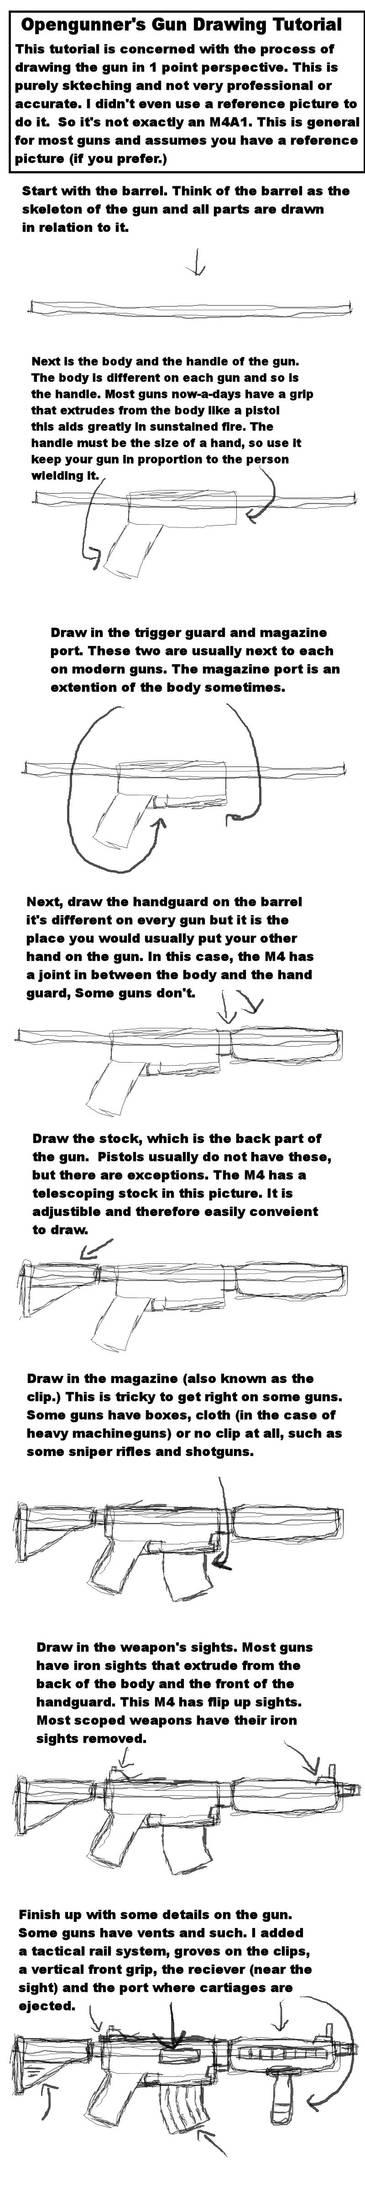 Simple Gun Drawing Tutorial By Opengunner On Deviantart